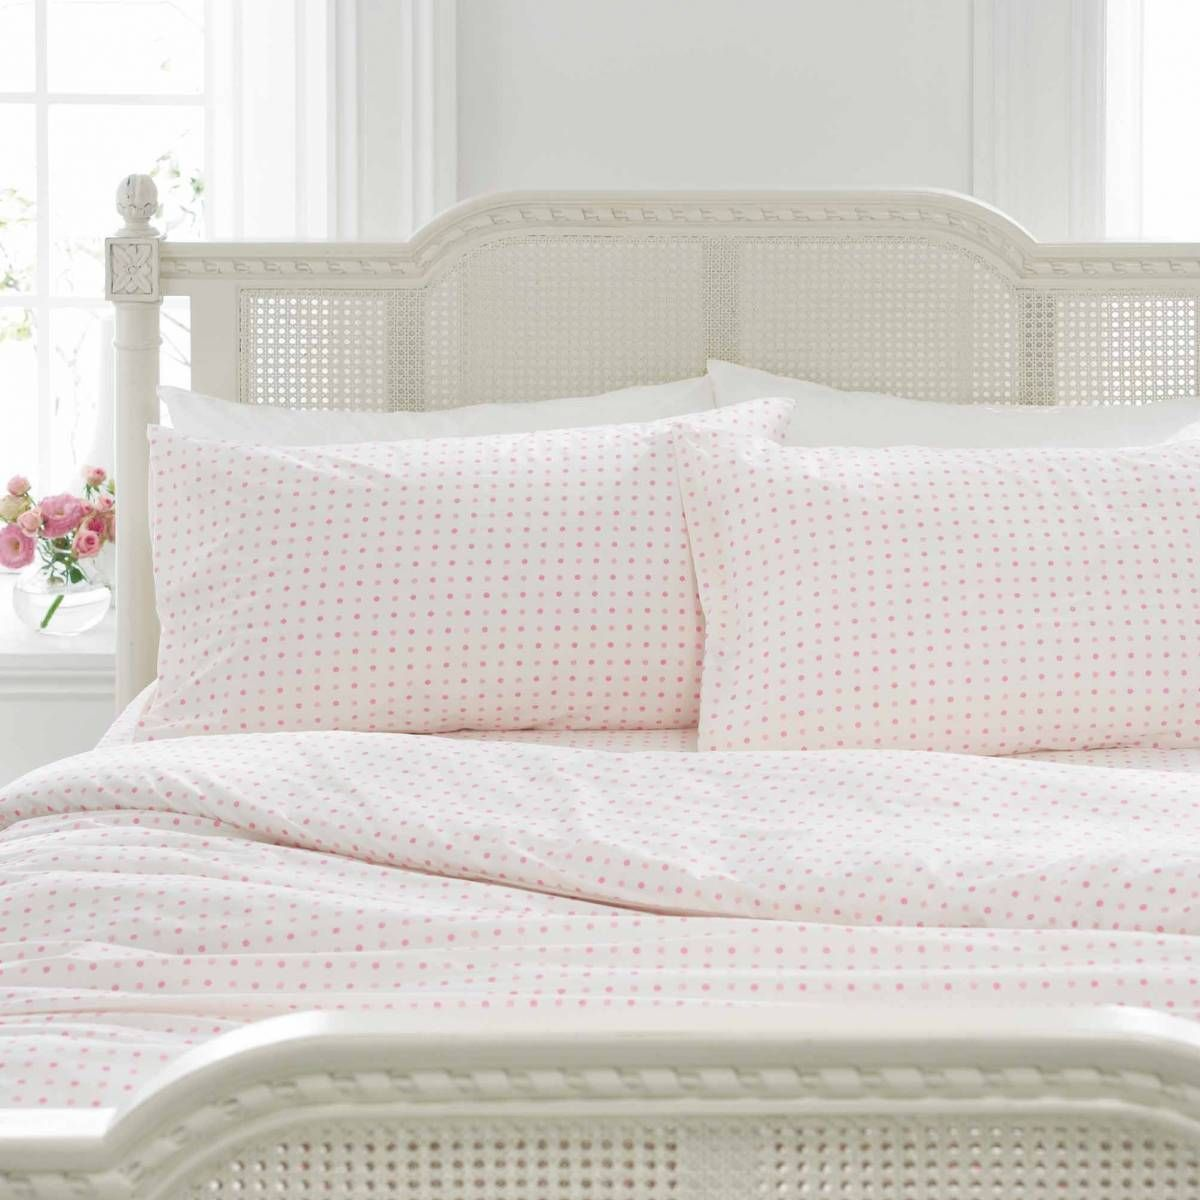 Pink Polka Dot Bedding | Polka Dot Duvet Set | Polka Dot Fitted Sheets